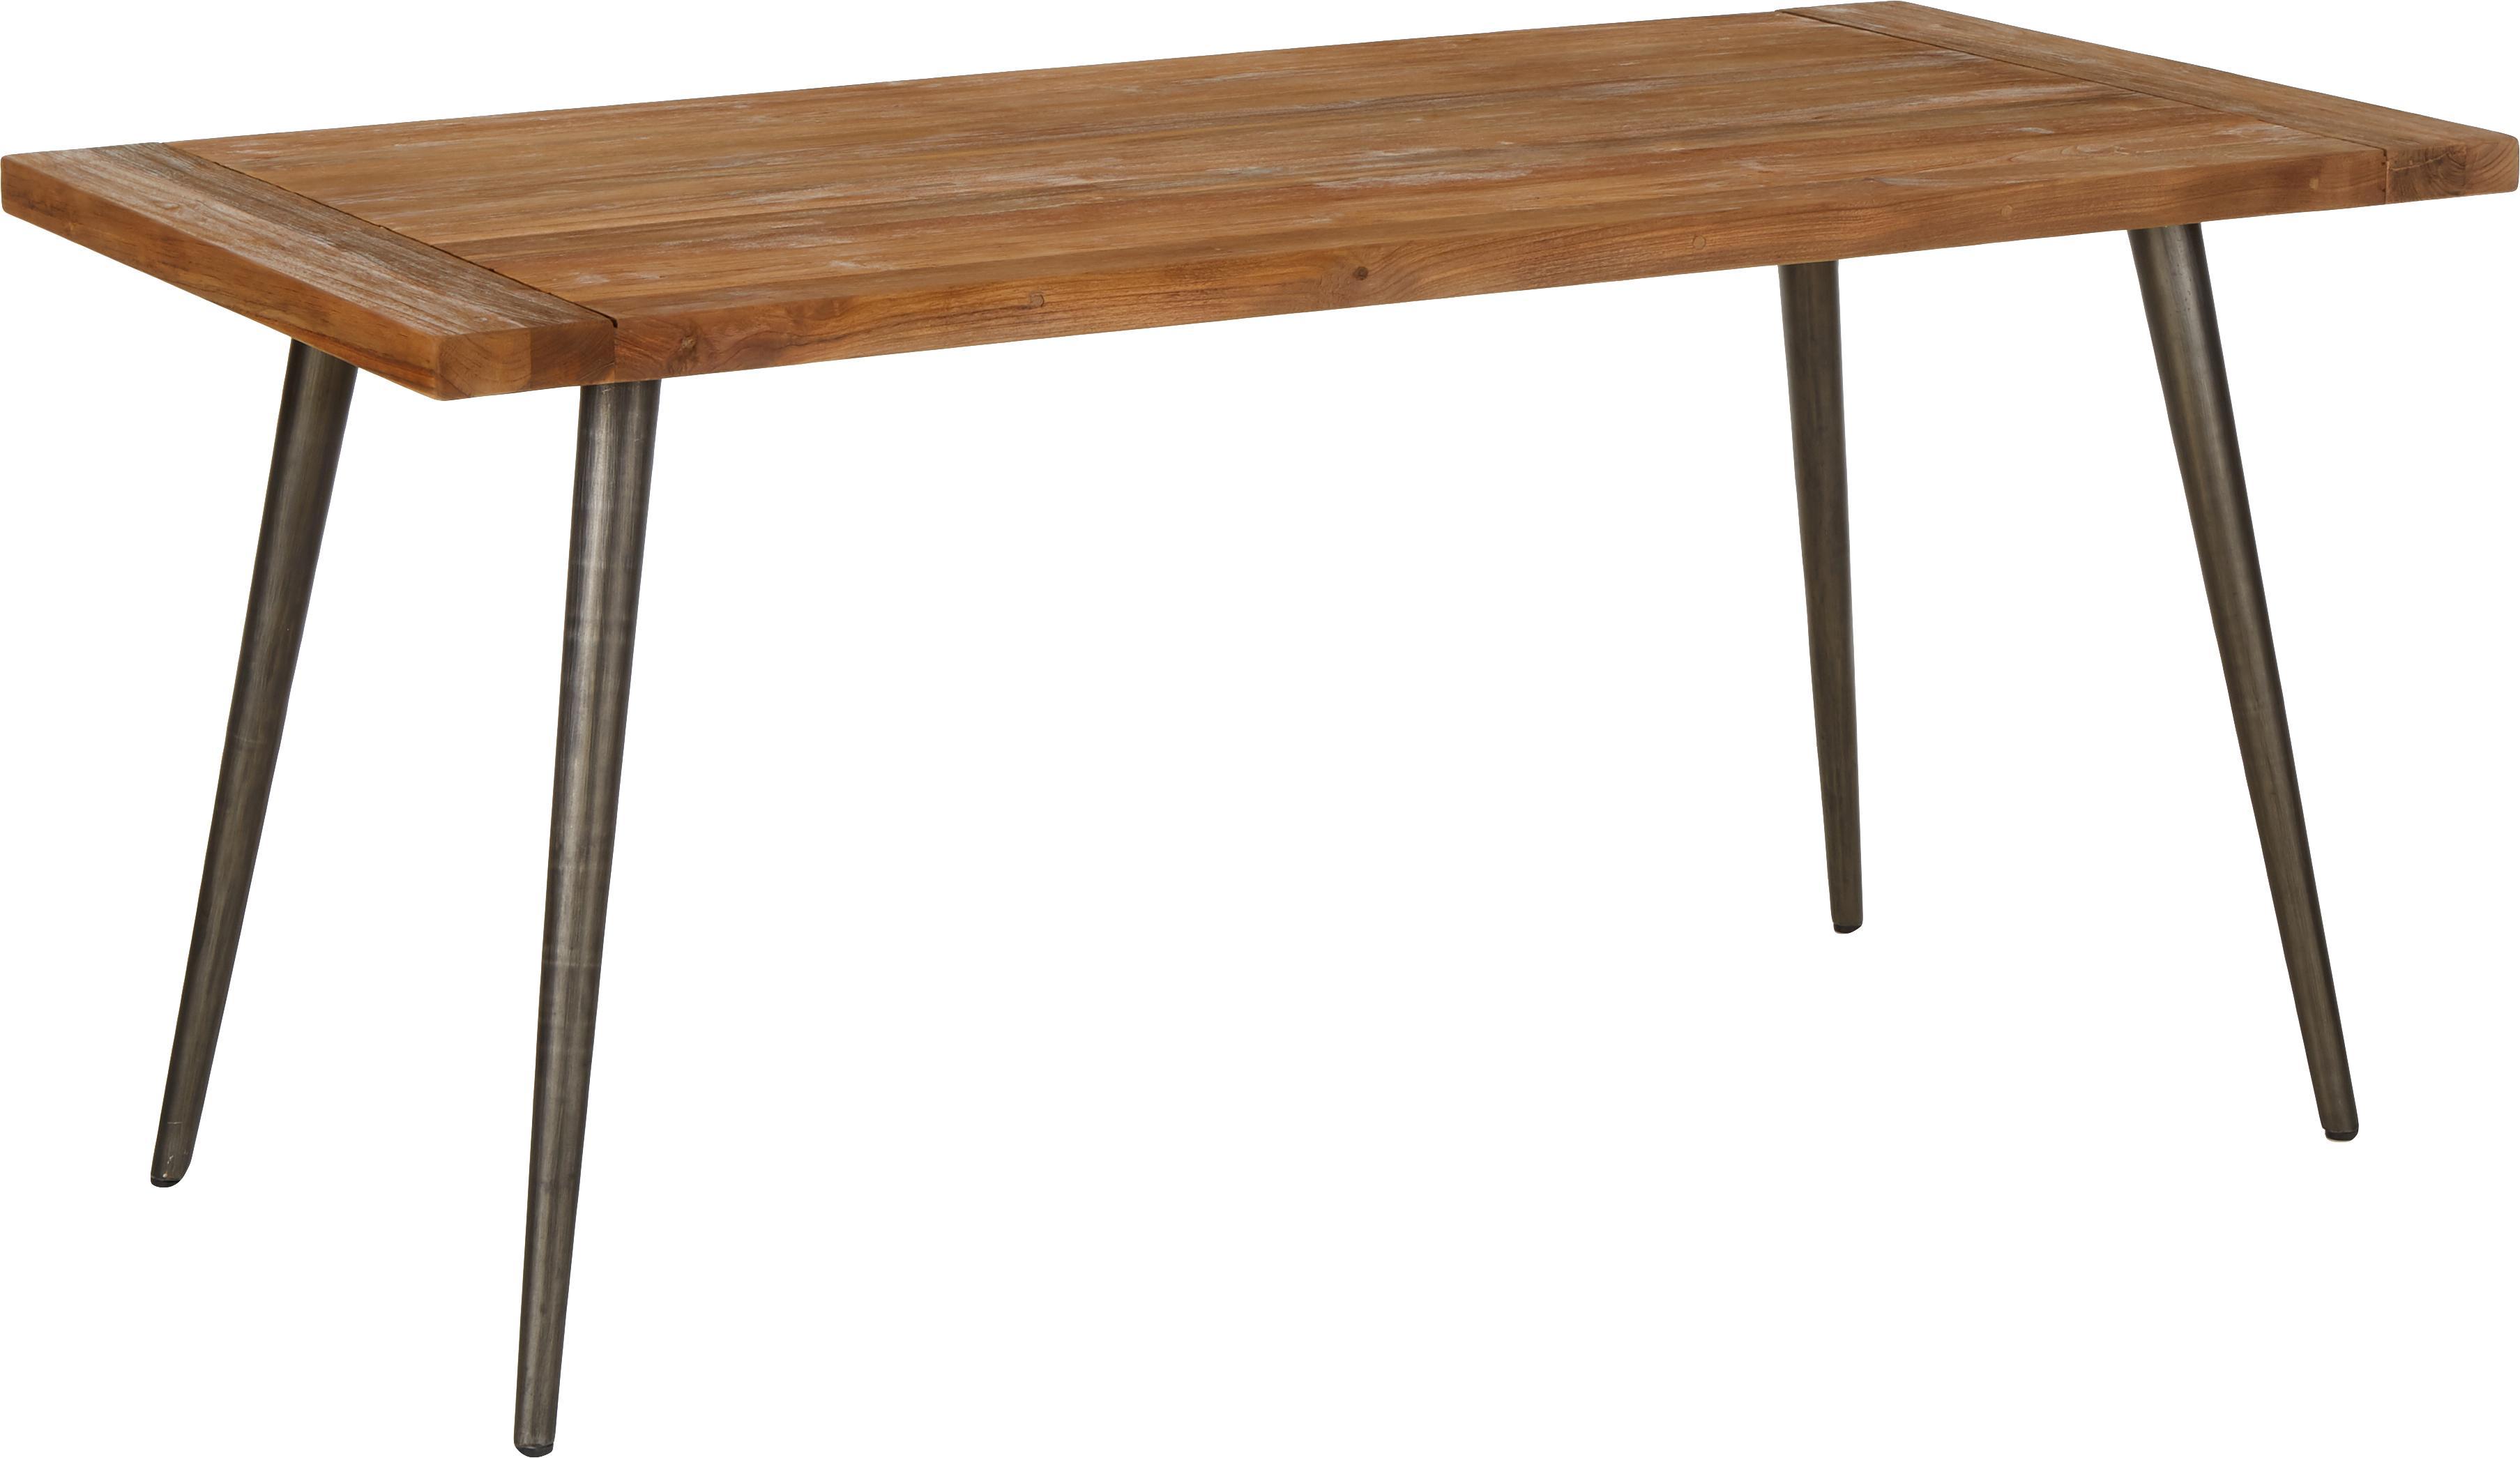 Mesa de comedor Kapal, tablero de madera maciza, Tablero: madera de teca maciza rec, Patas: acero con marcas de desga, Teca, negro, An 160 x F 80 cm